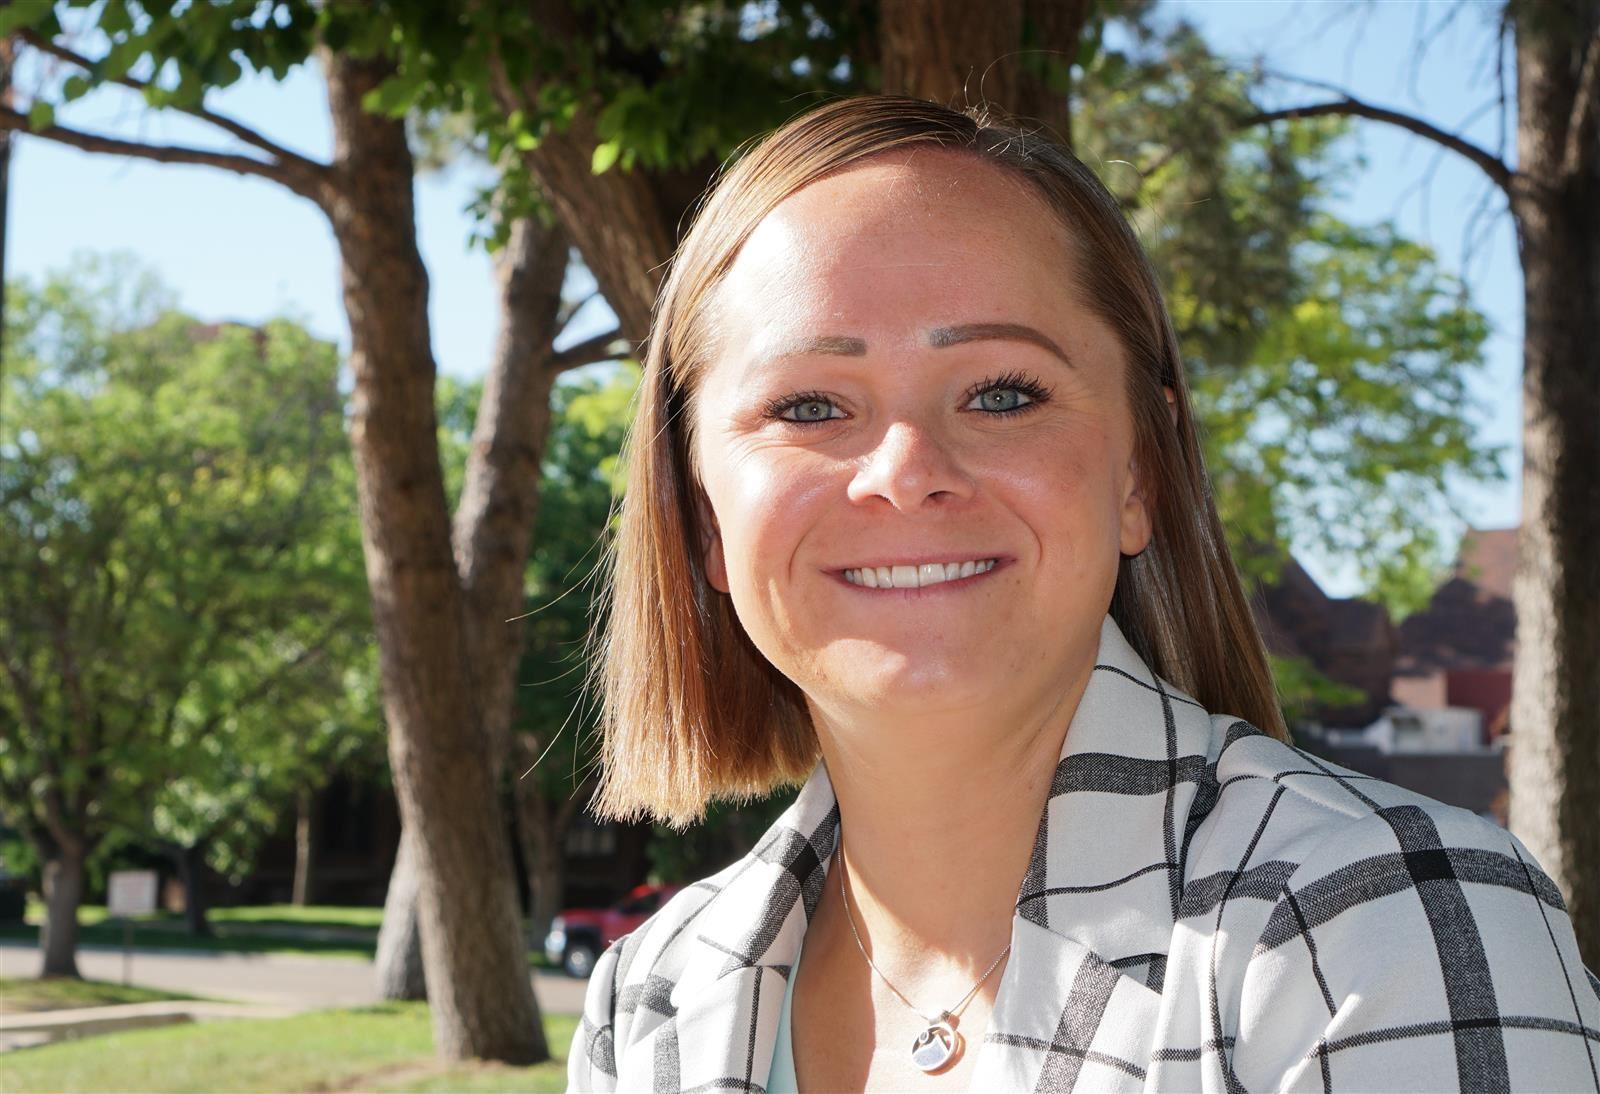 Principal Stephanie Markert